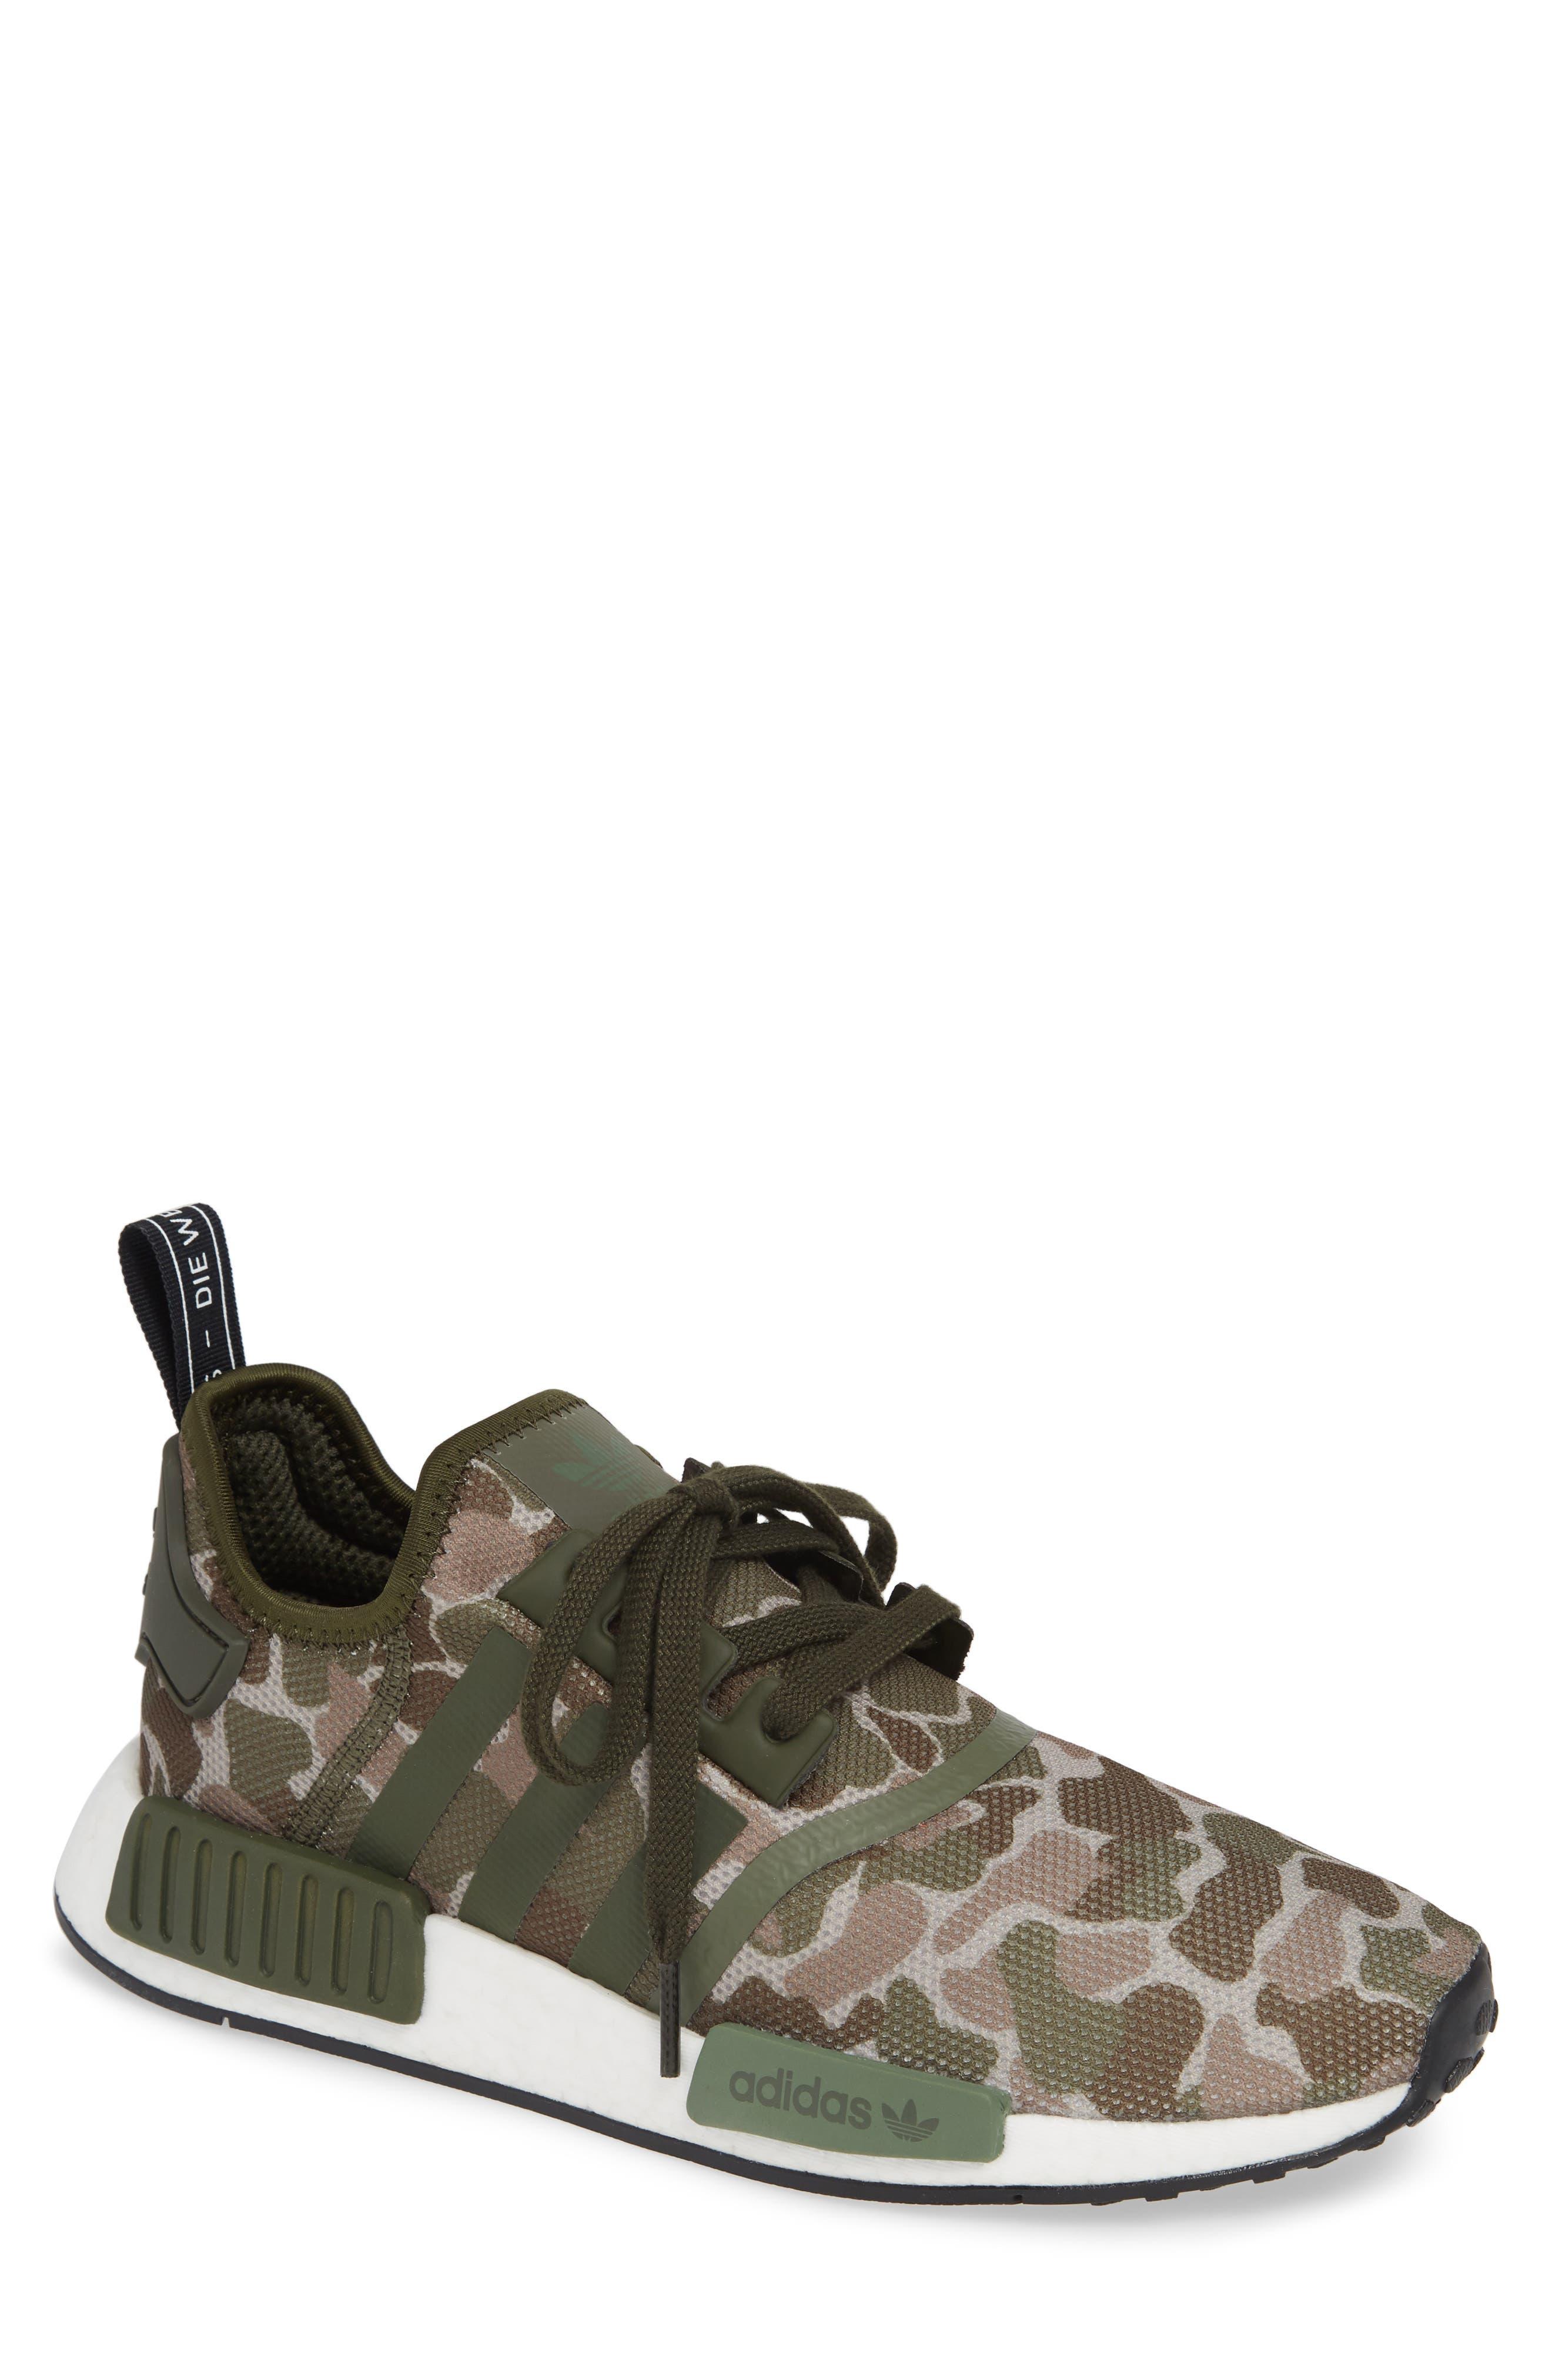 NMD R1 Camo Sneaker,                             Main thumbnail 1, color,                             305